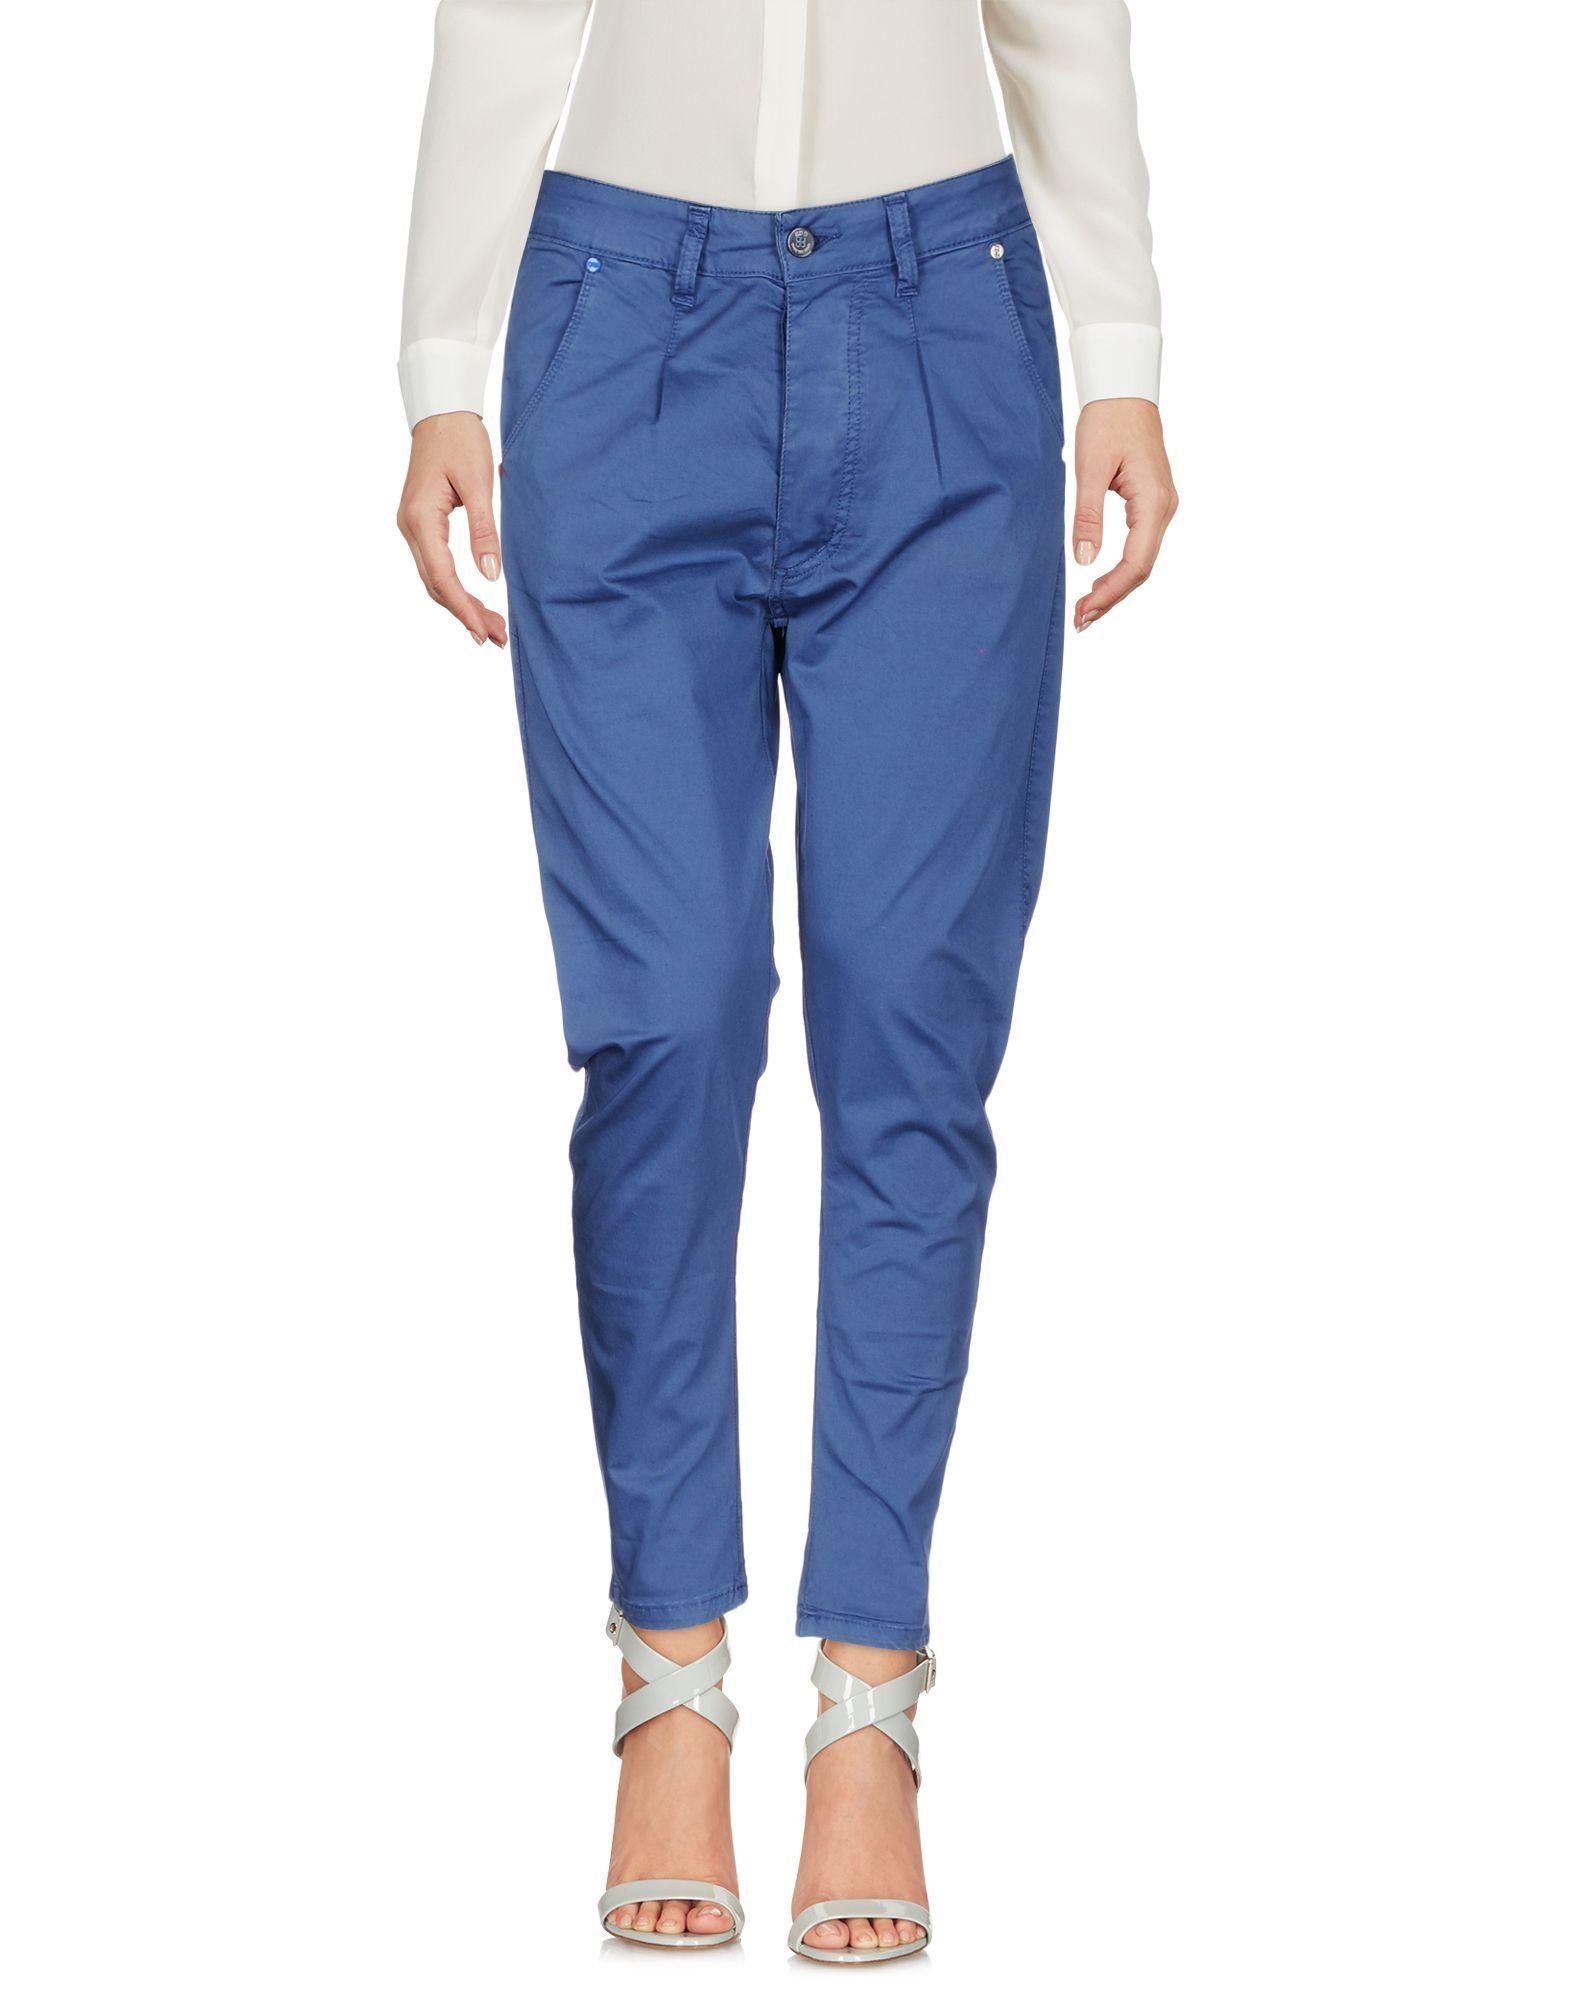 TROUSERS Eredi Del Duca Blue Woman Cotton